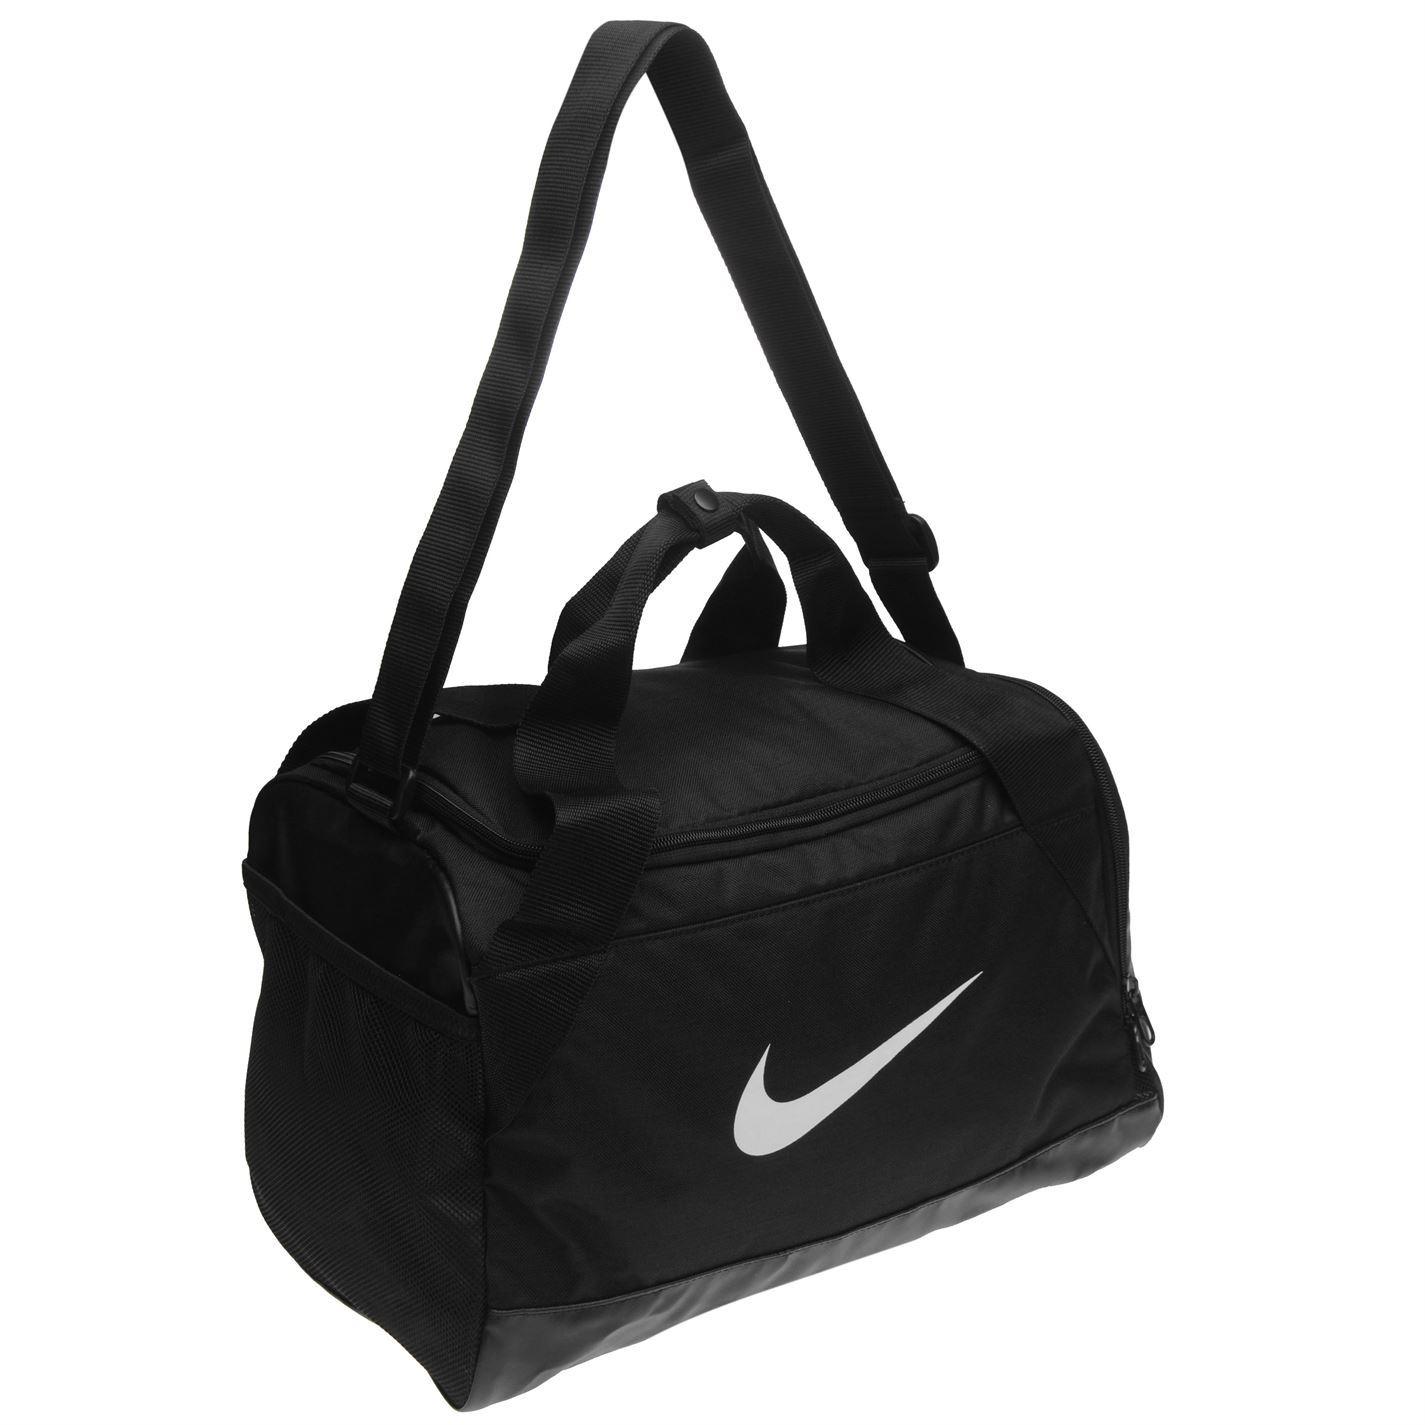 ... Nike Brasilia XS Grip Sports Holdall Black White Gym Kit Bag Carryall  ... e624bb3a33851